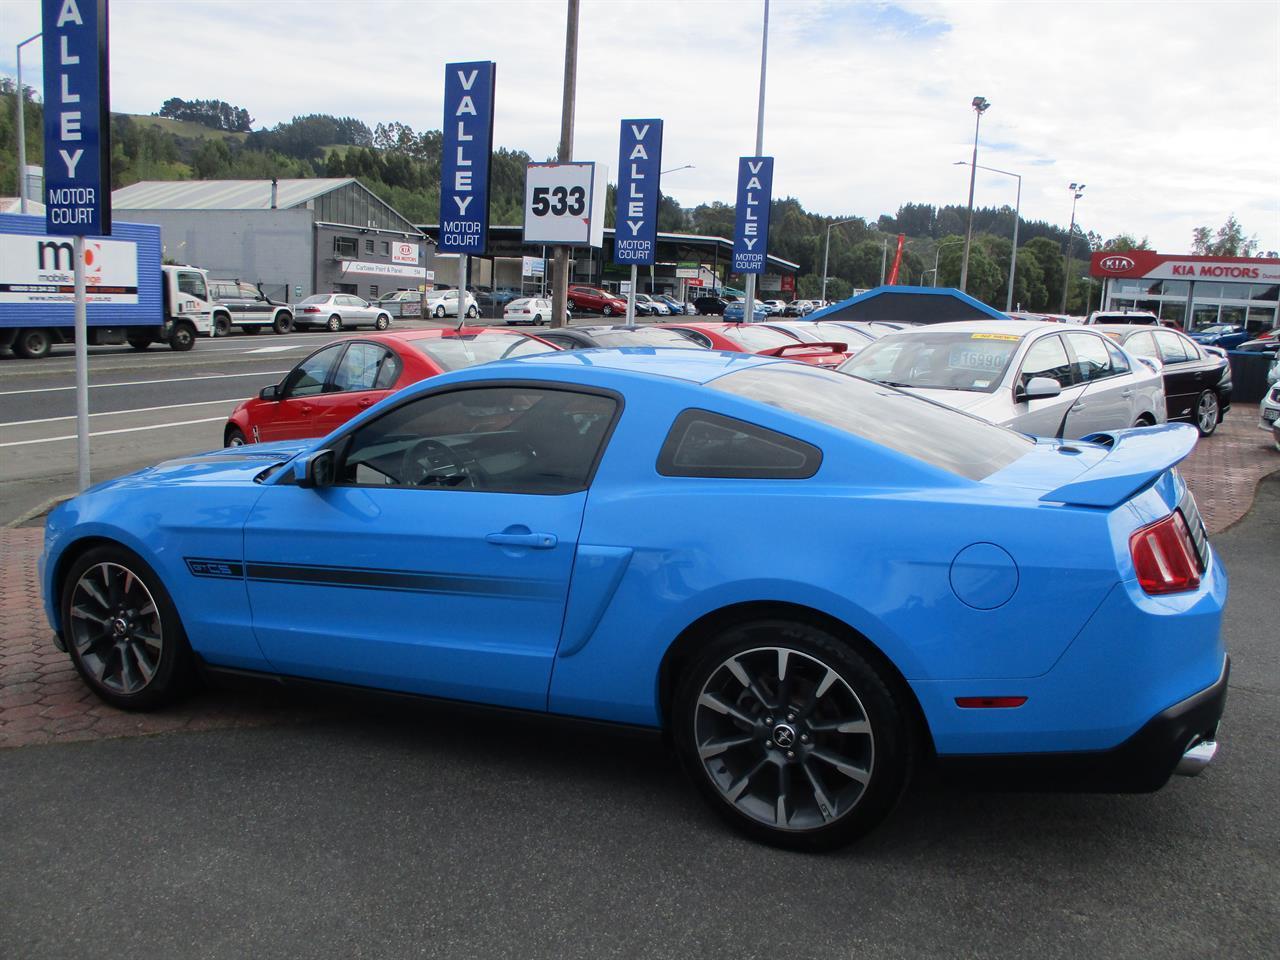 image-6, 2012 Ford Mustang GT/CS at Dunedin